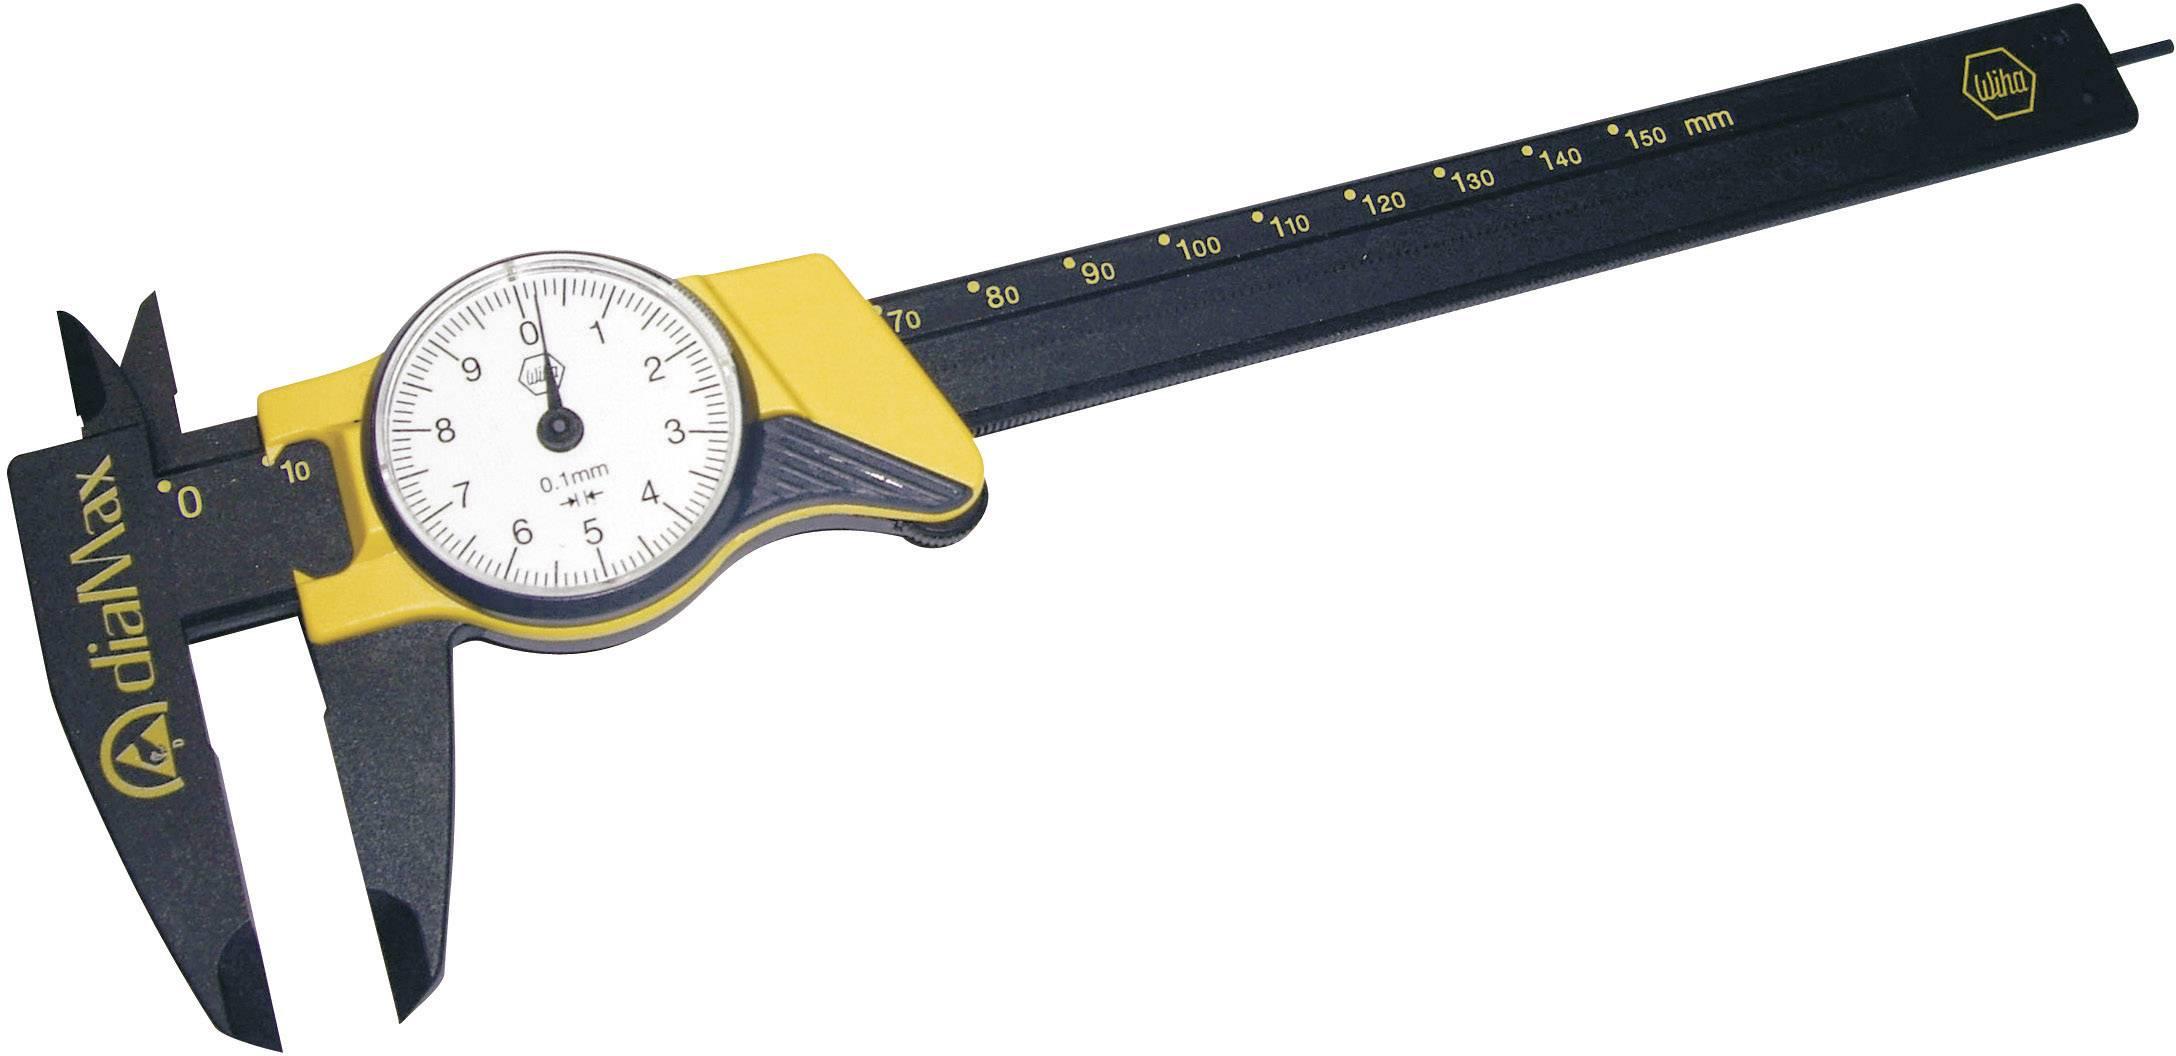 ESD posuvné měřítko s ciferníkem Wiha DIALMAX 31439, měřicí rozsah 150 mm, Kalibrováno dle podnikový standard (bez certifikátu) (own)